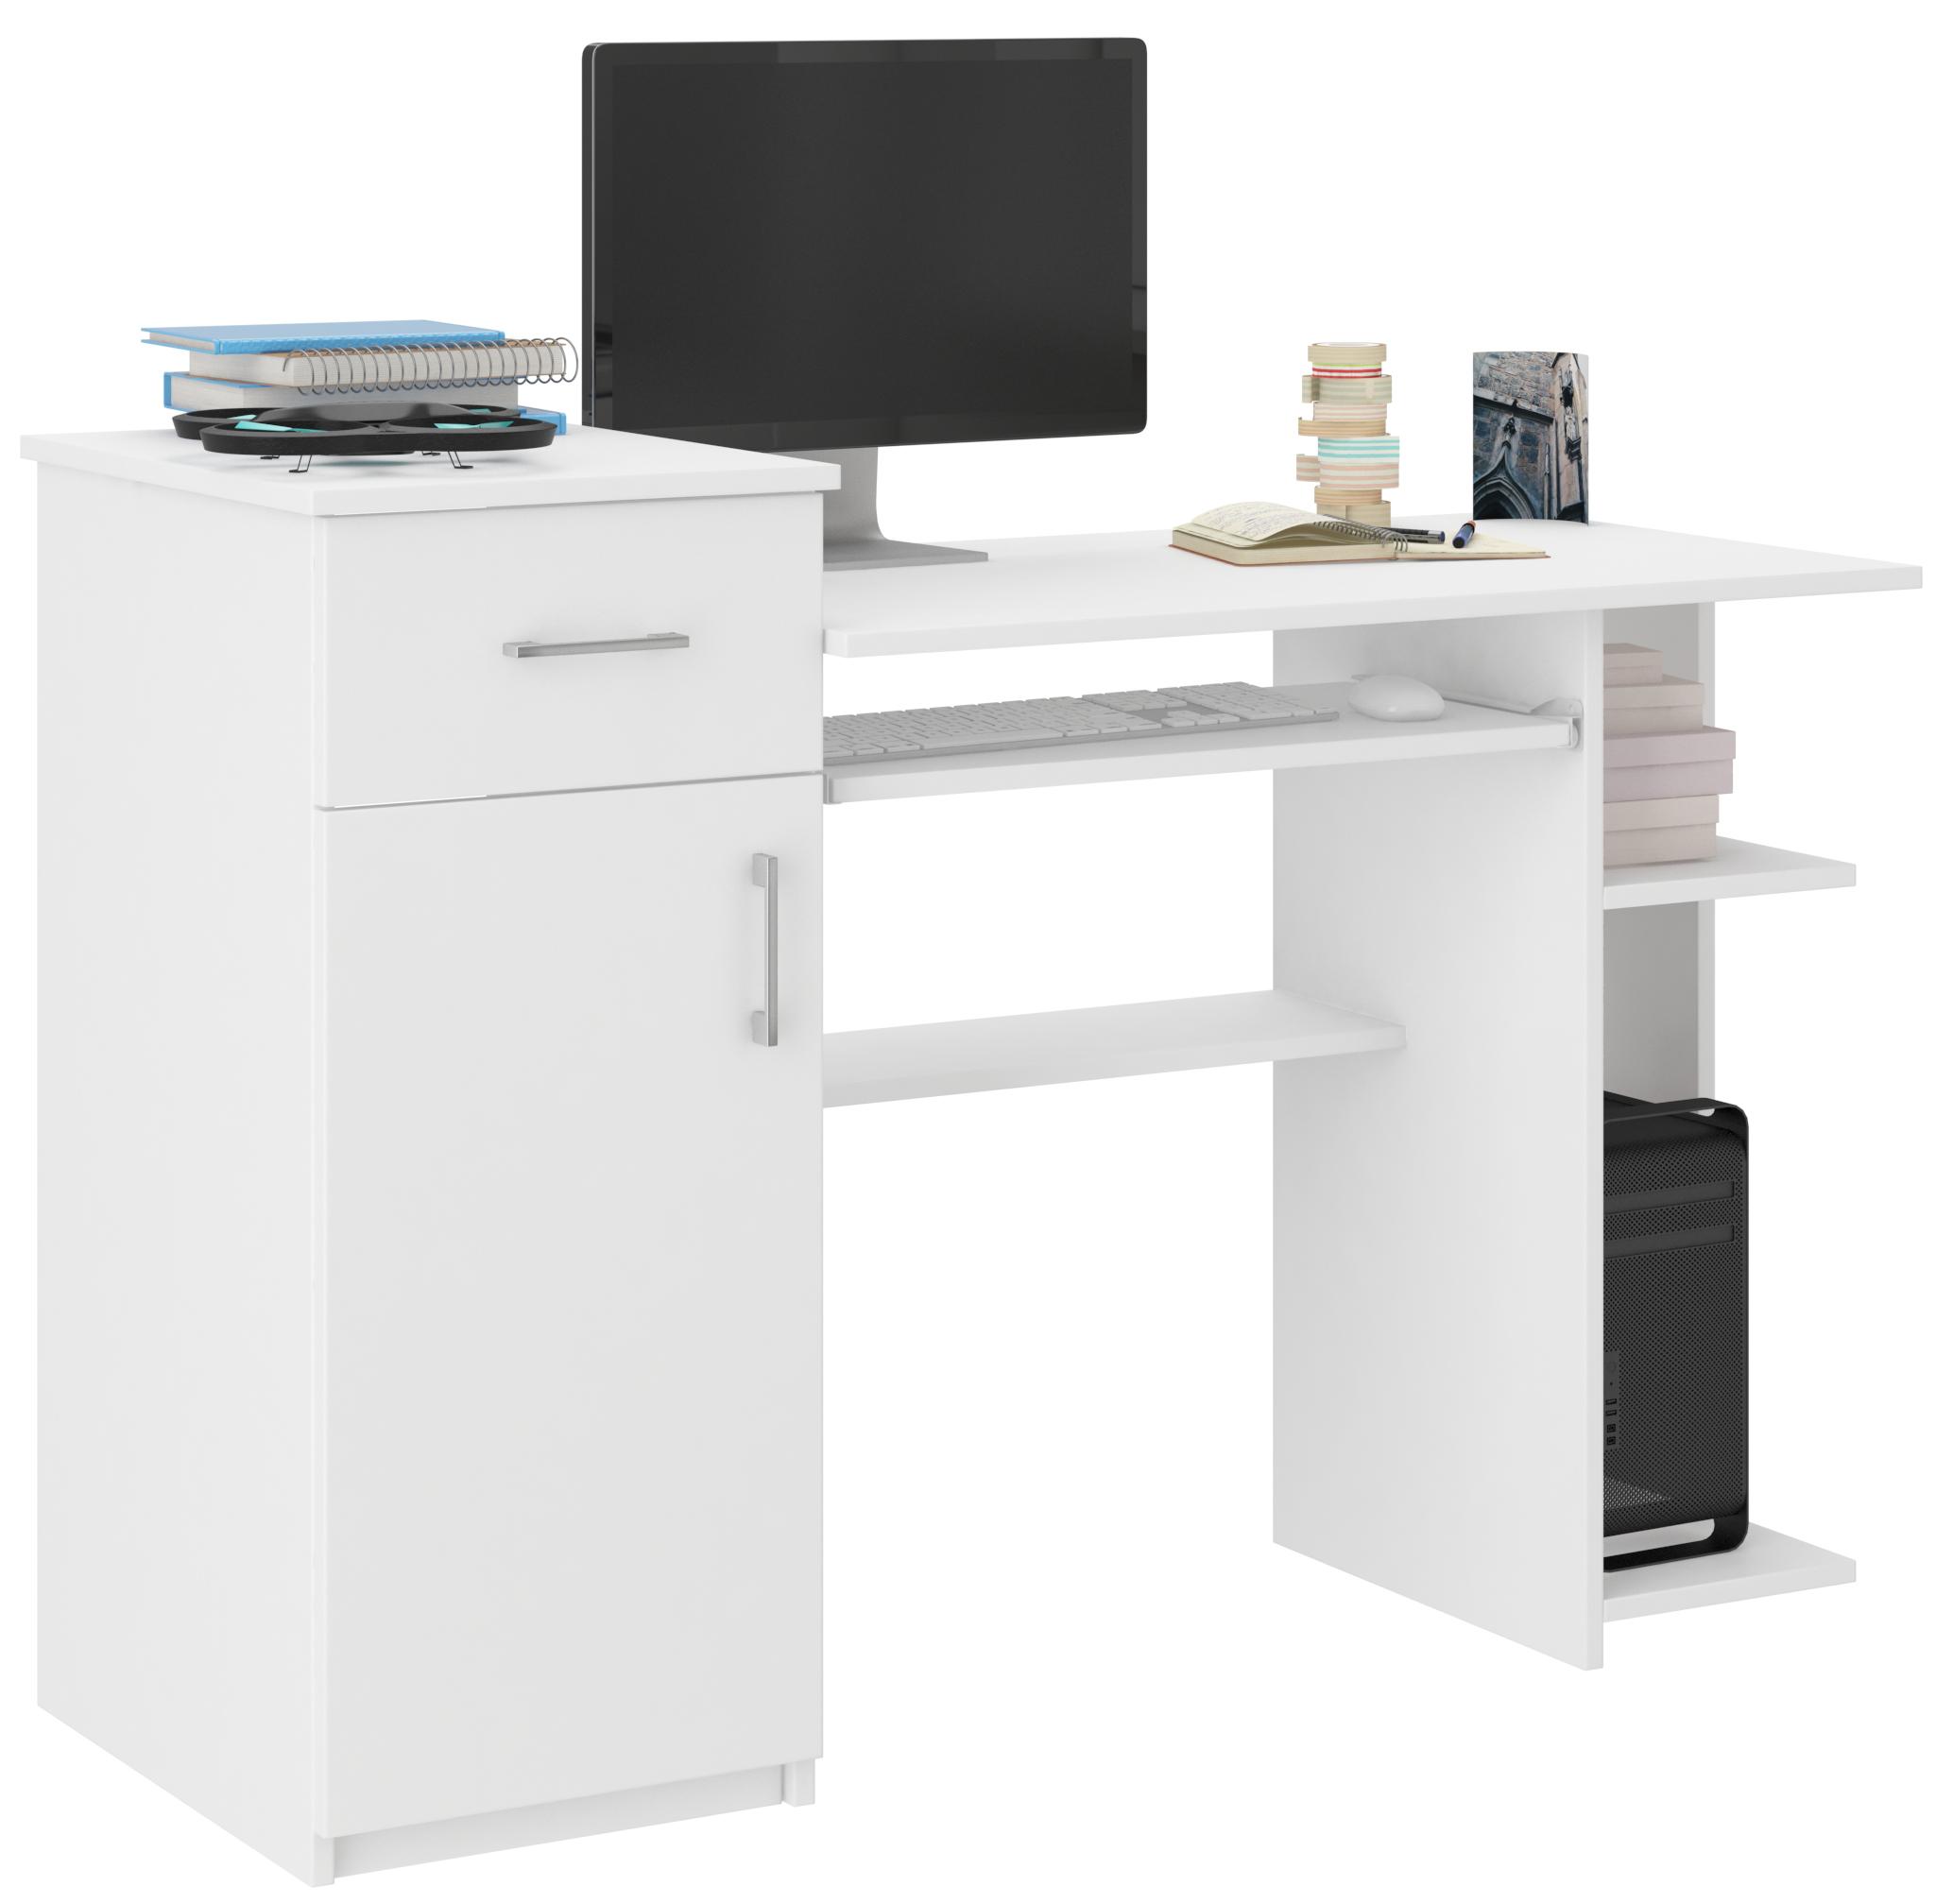 Biurko Komputerowe 76cm Stolik Laptop Białe N 8 Pl